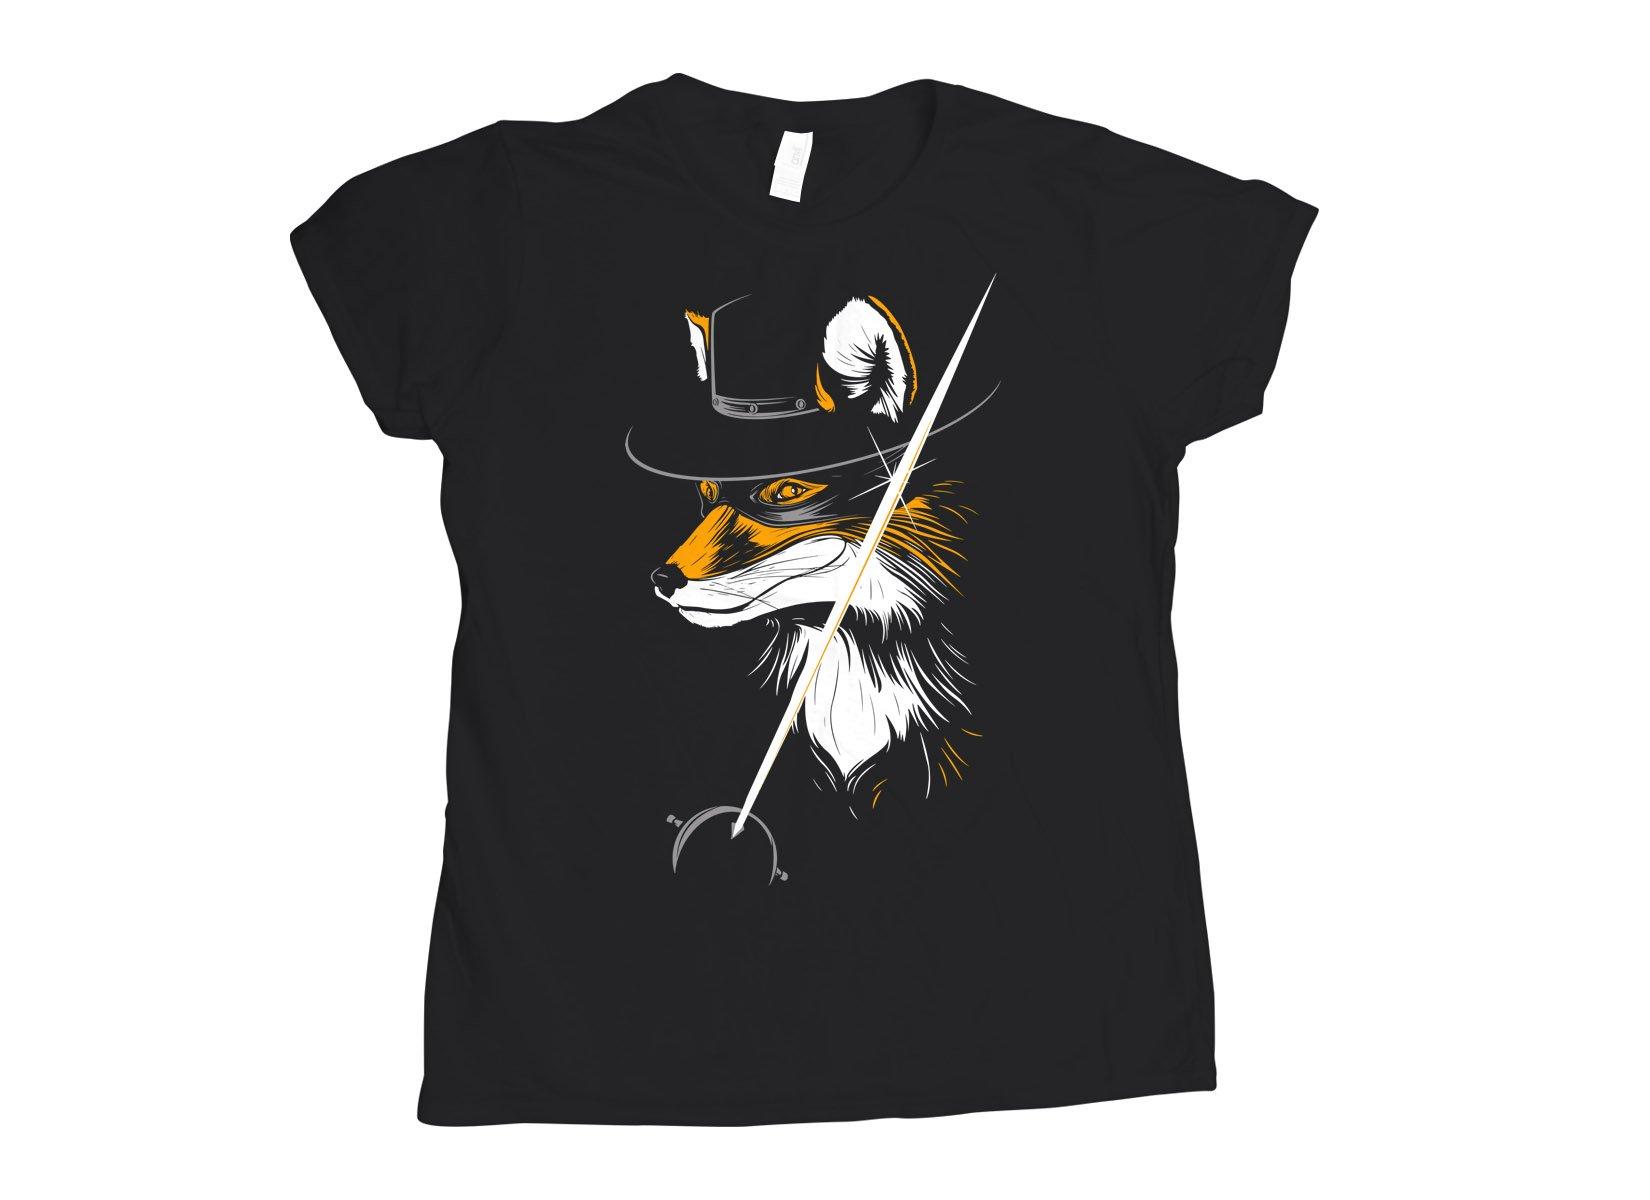 The Fox on Womens T-Shirt